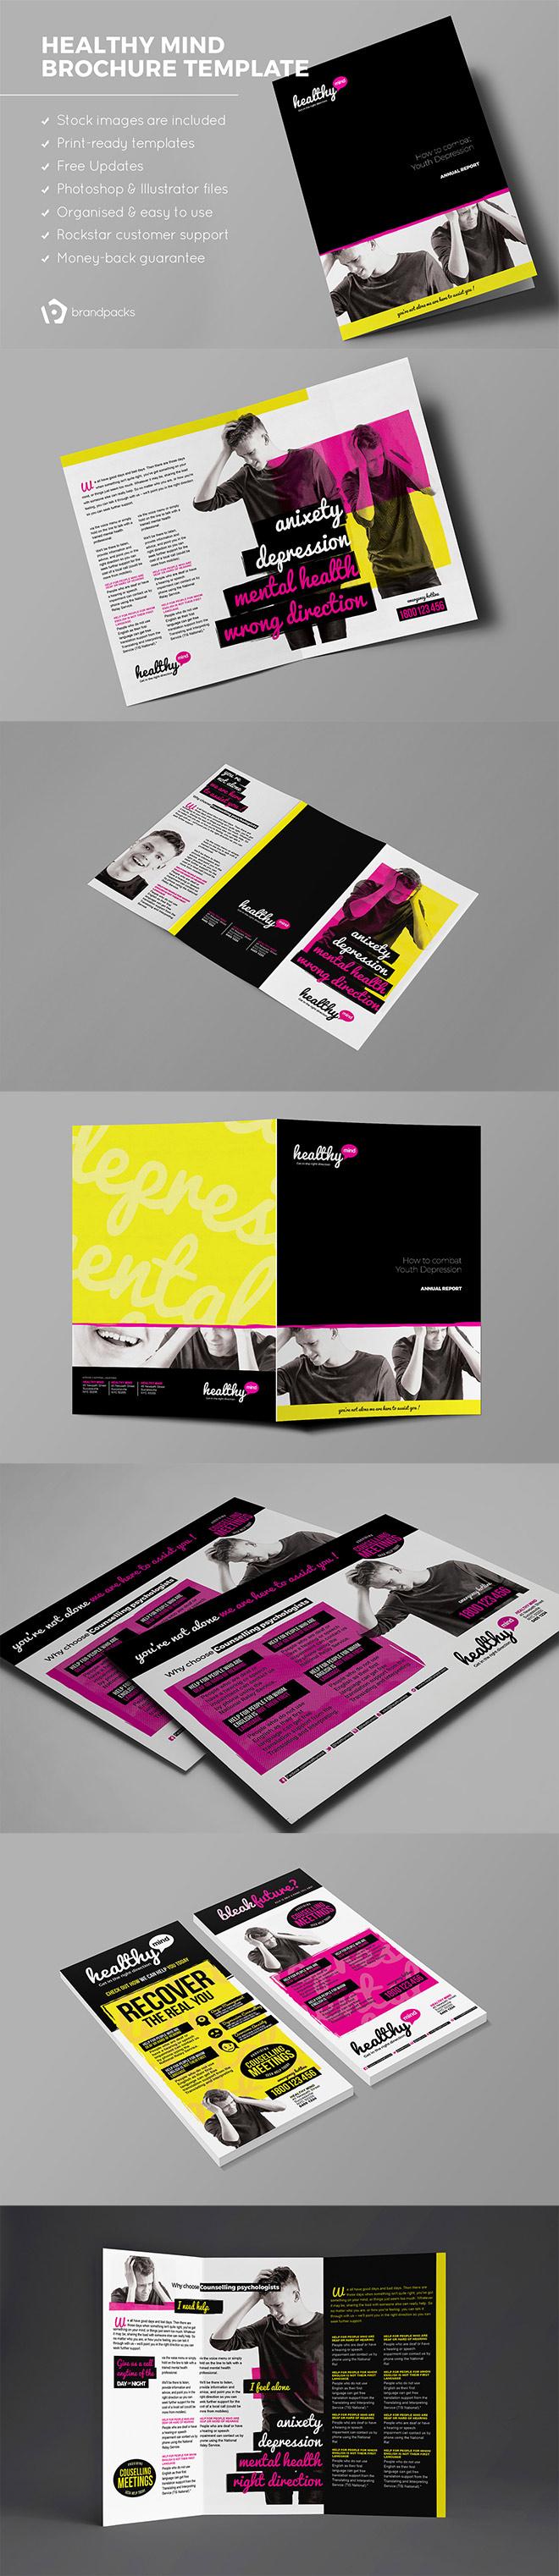 Healthy Mind Brochure Template Pack